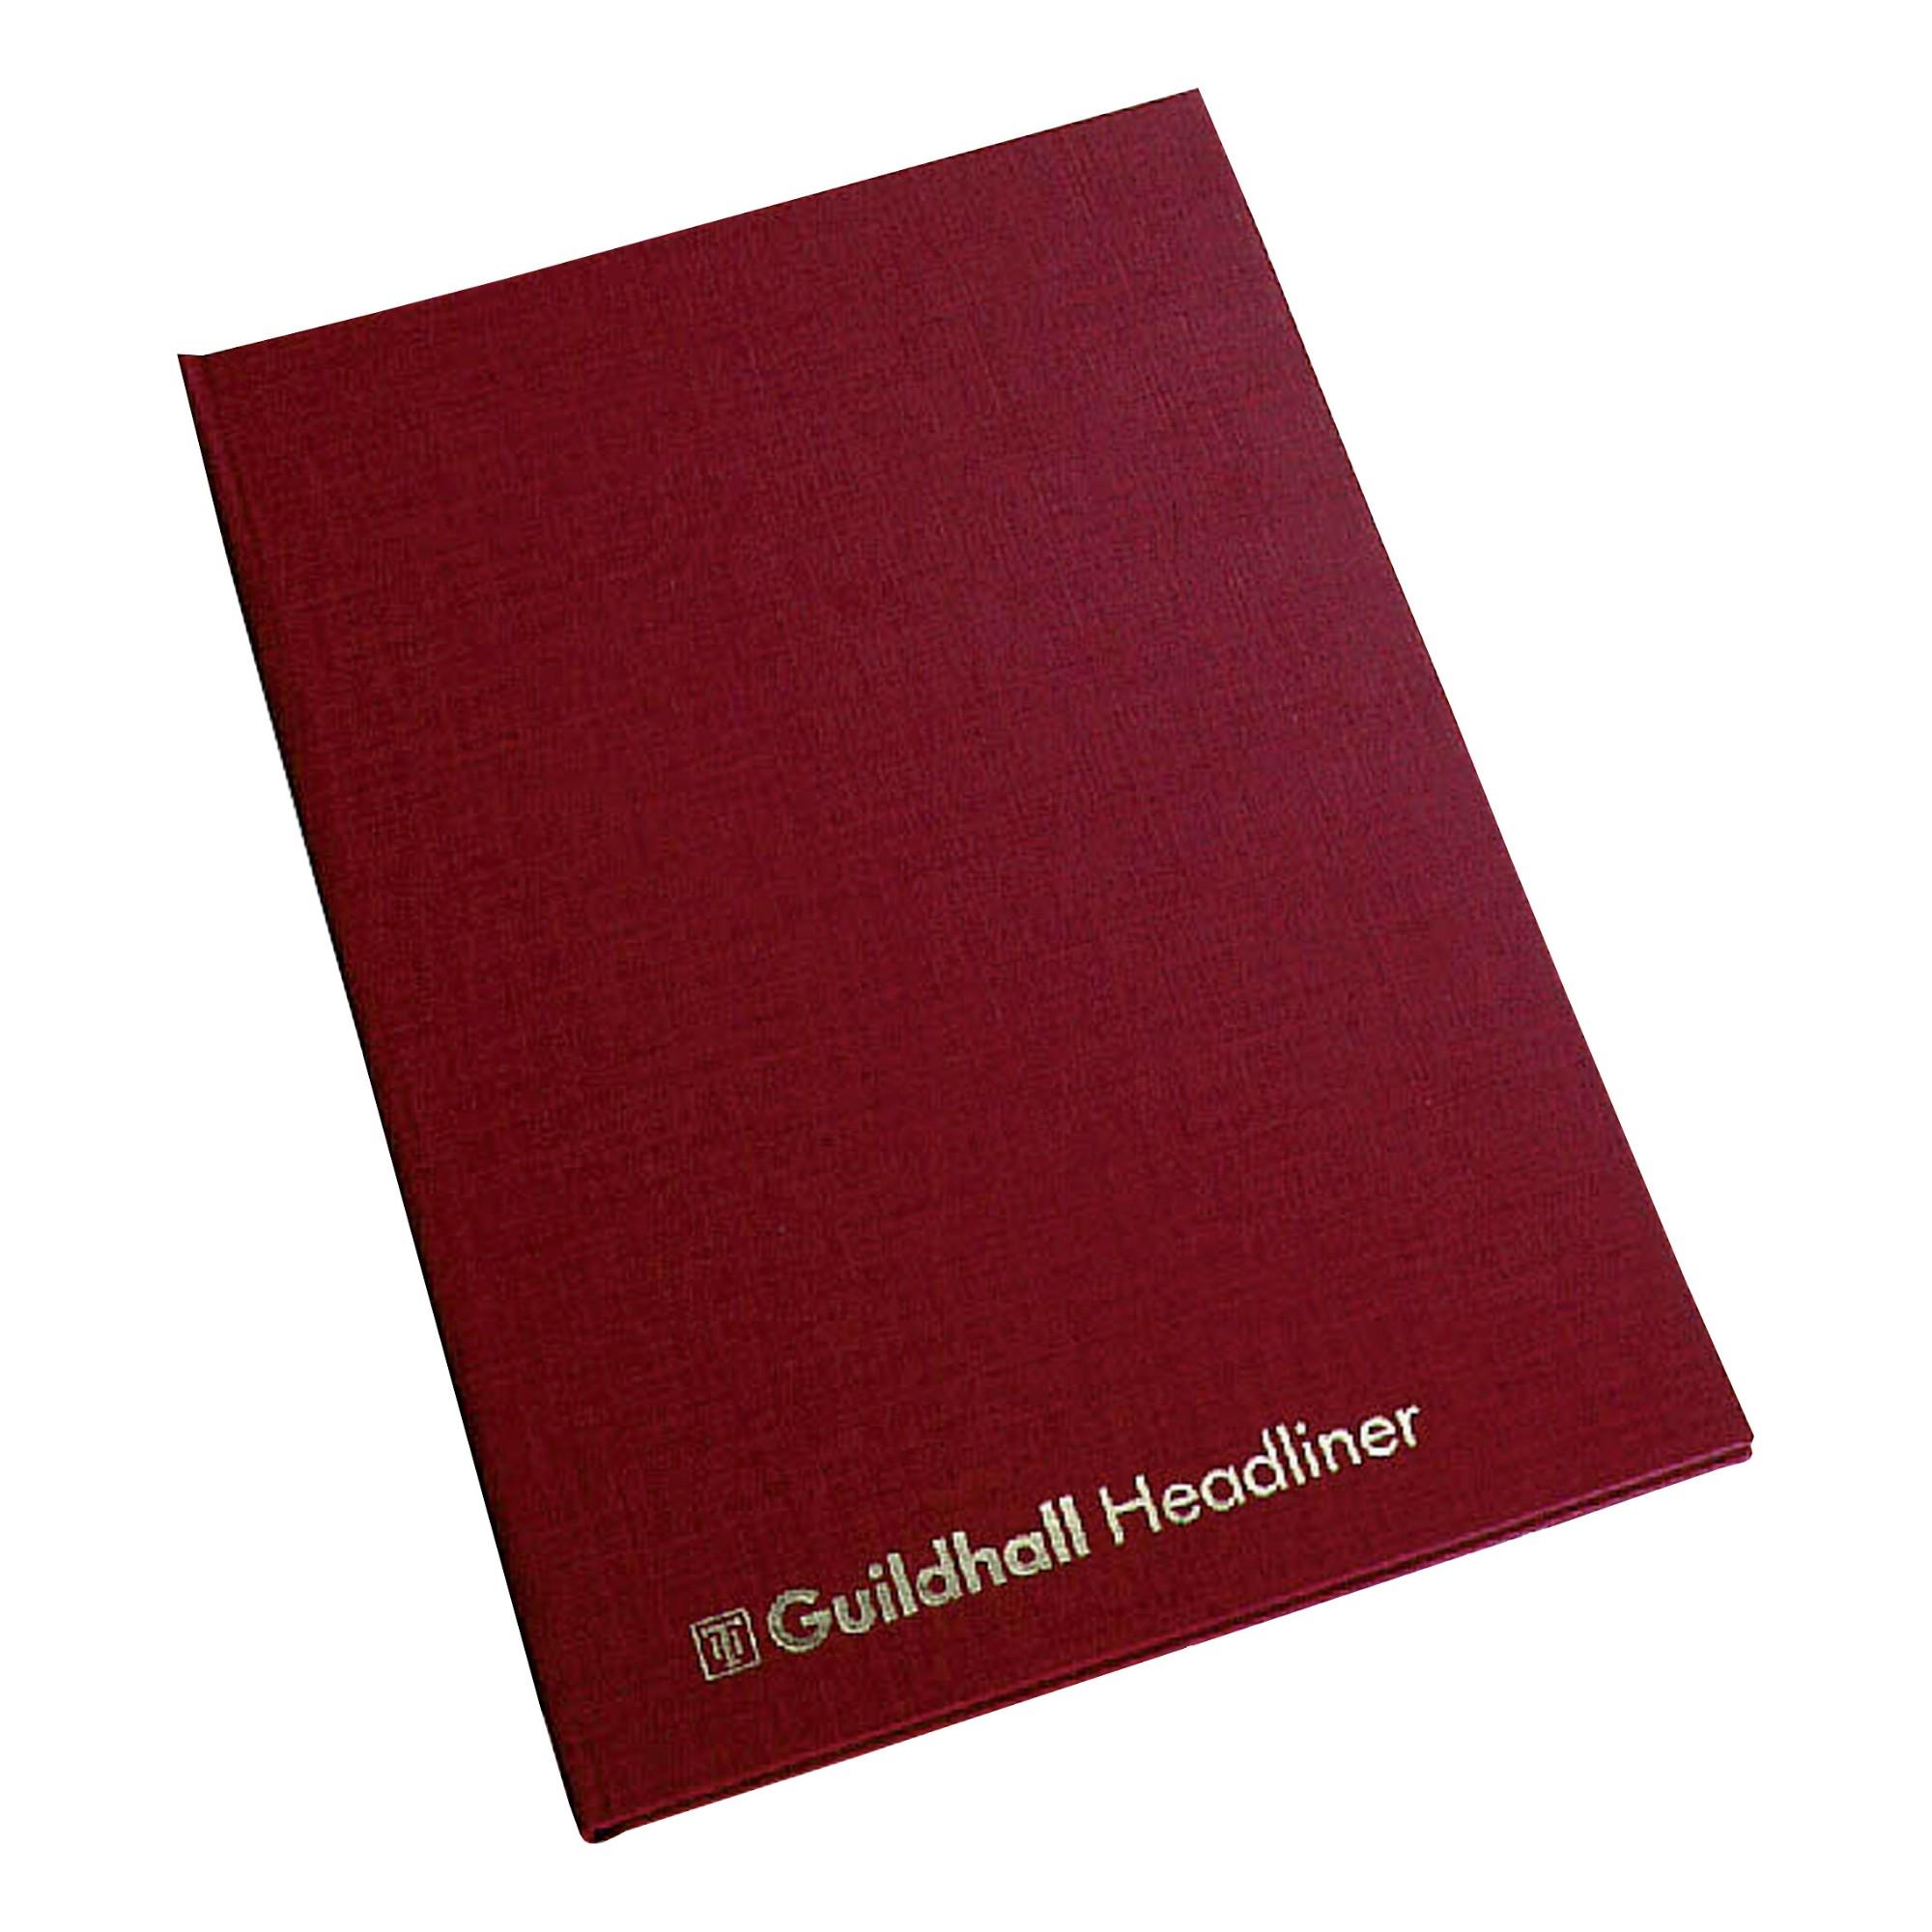 Guildhall 38/6Z Headliner Book 1147